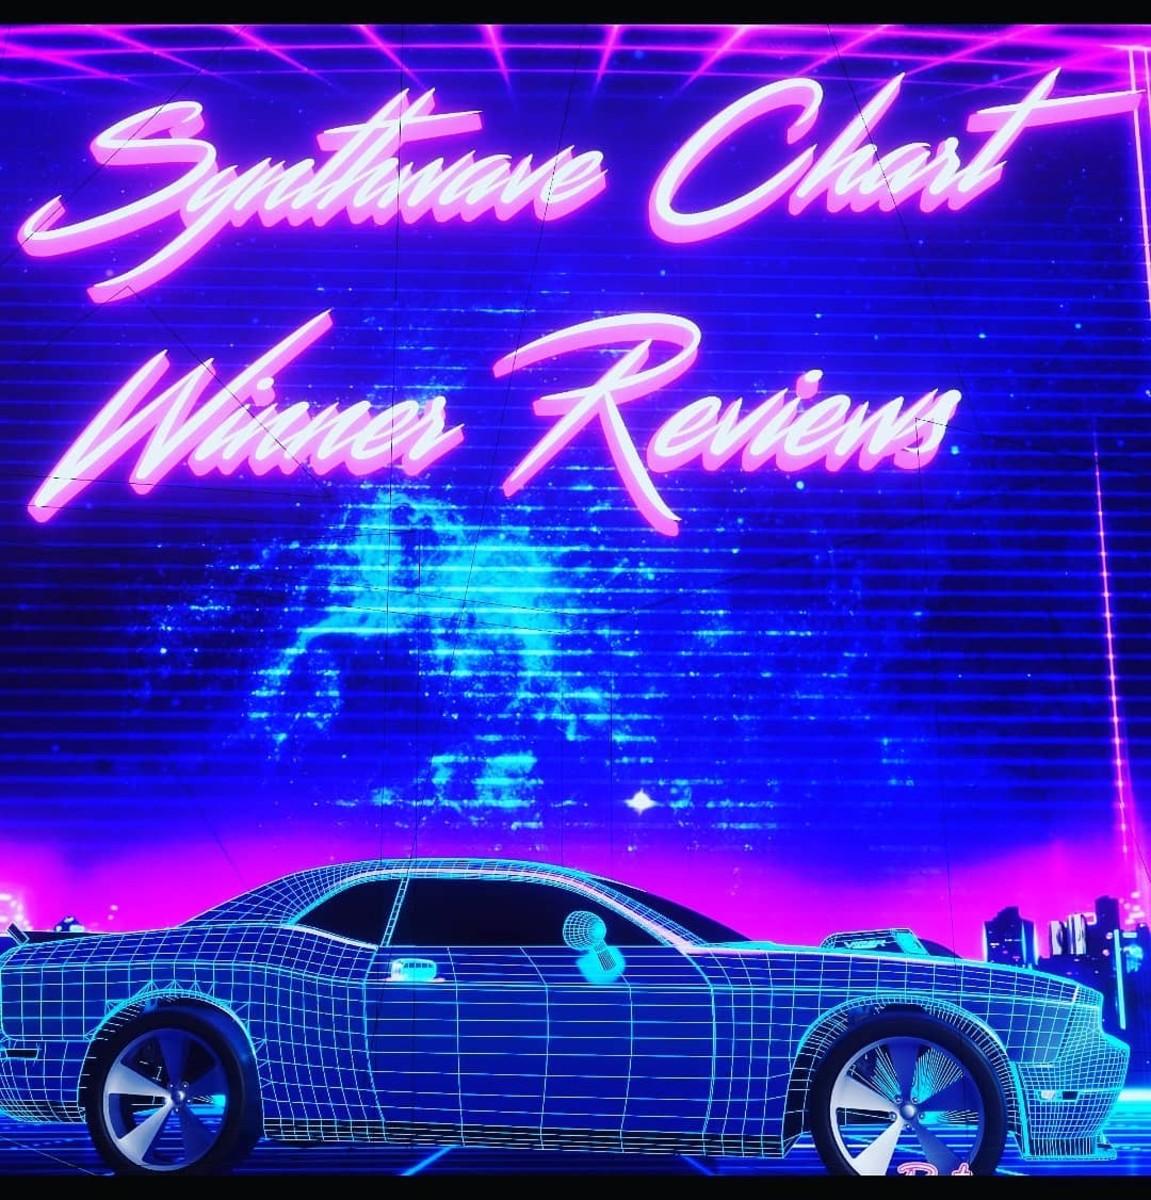 Retro Reverb Records Top 3 May 2021